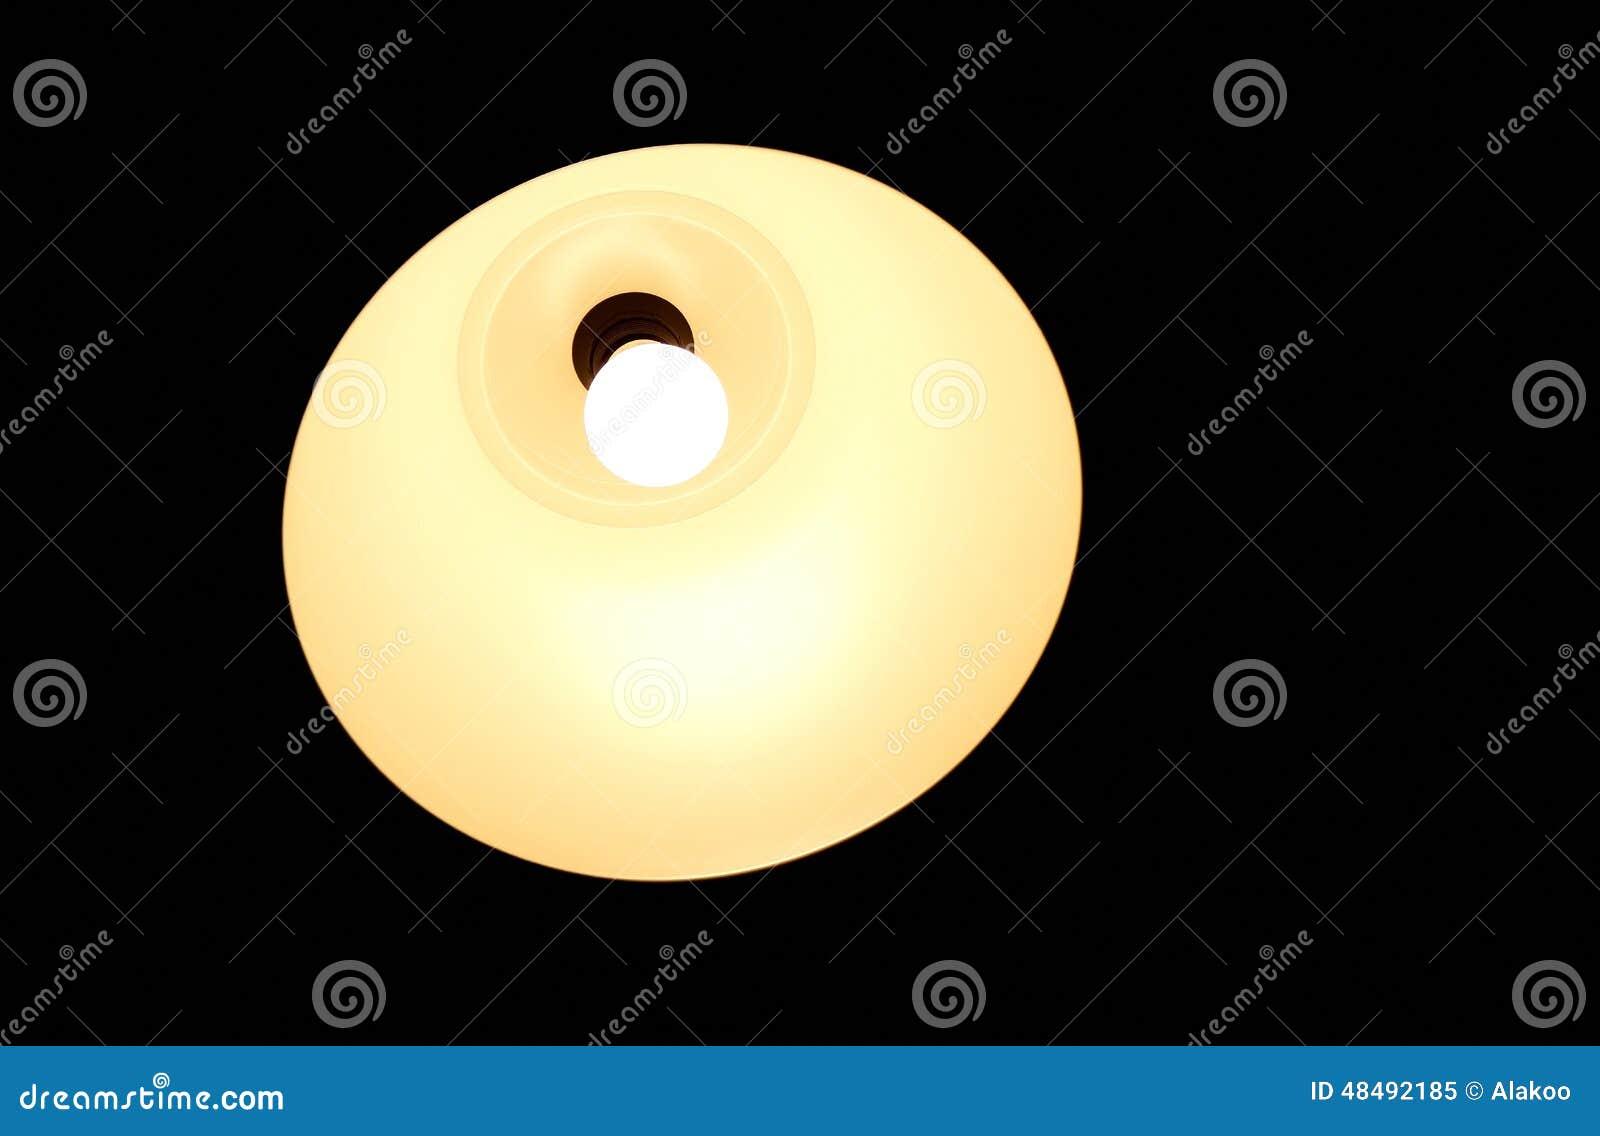 Bulb Lamp Cartoon On The White Background Vector Illust ...